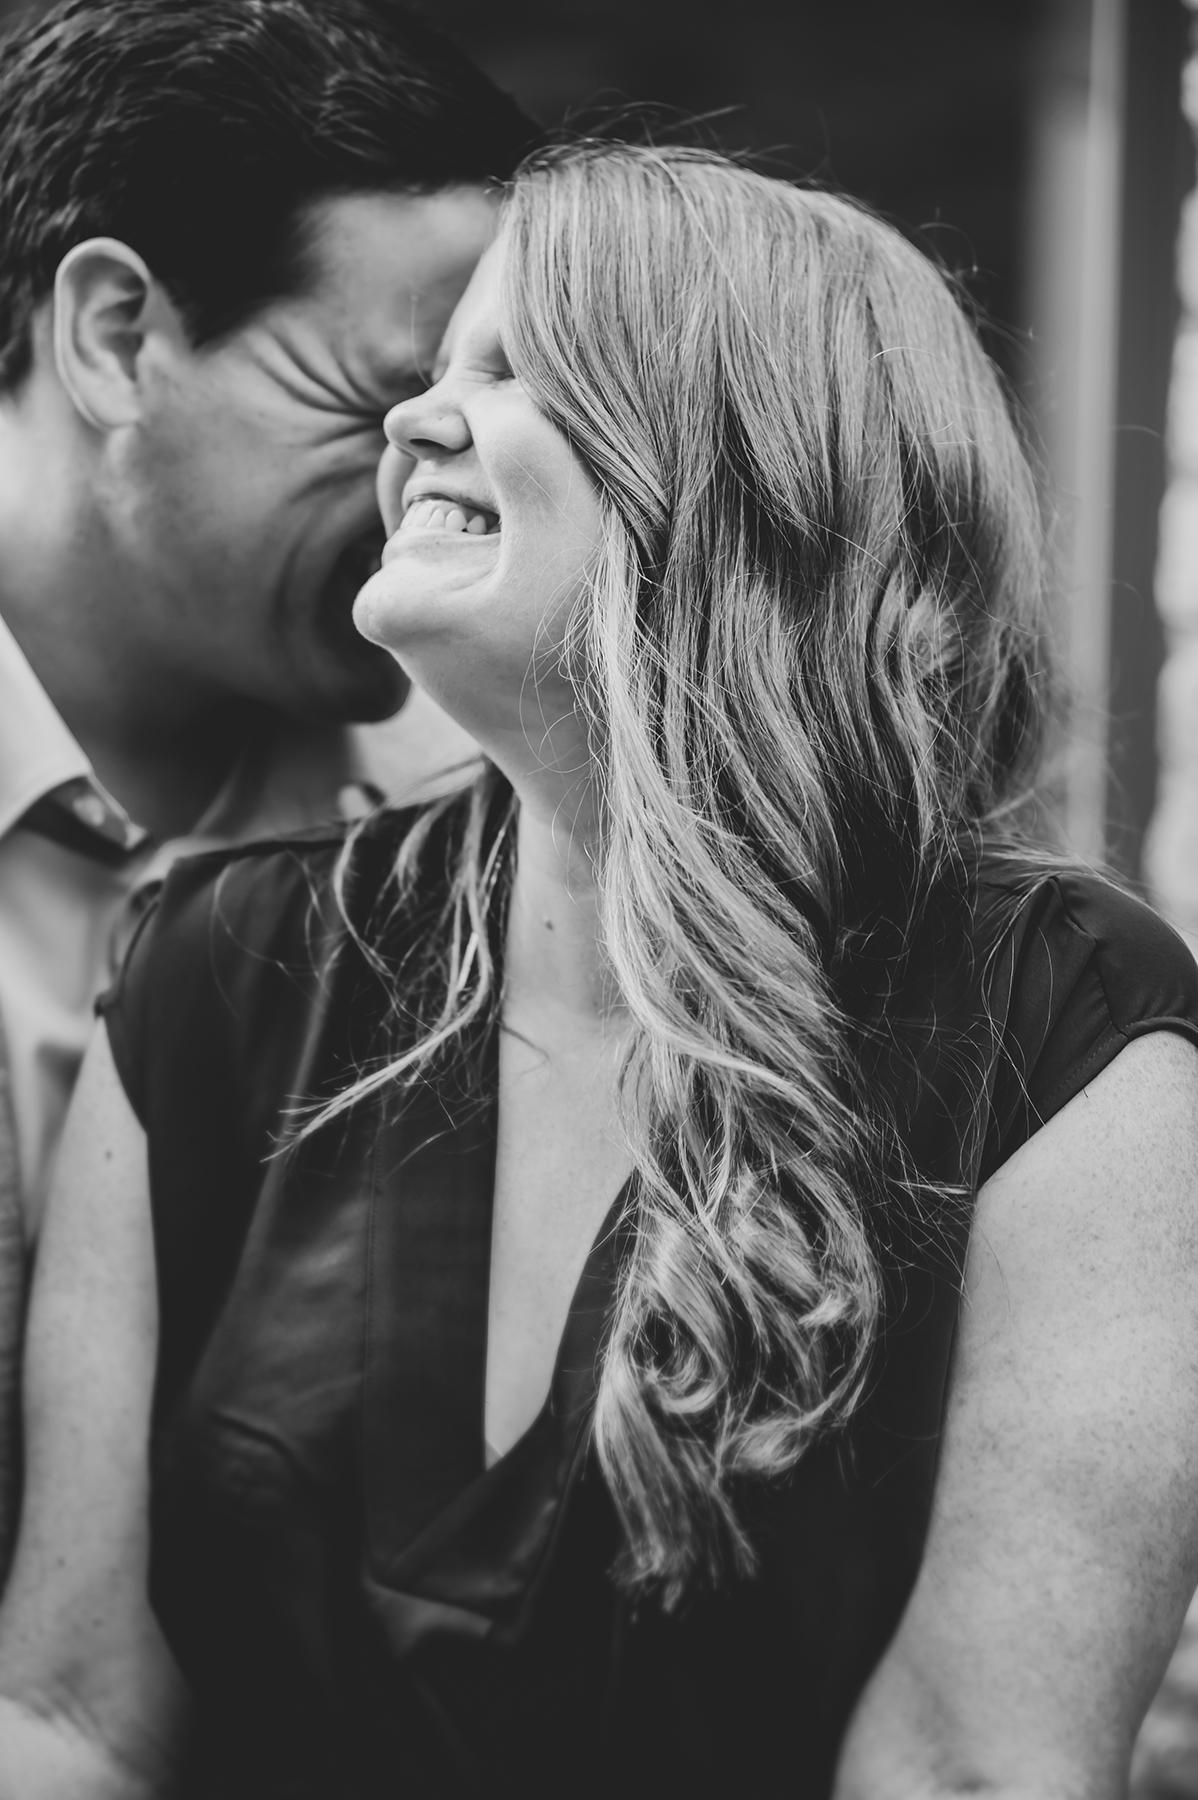 Dory_Engaged_libertyville_love_photographer_wedding_02 copy.jpg